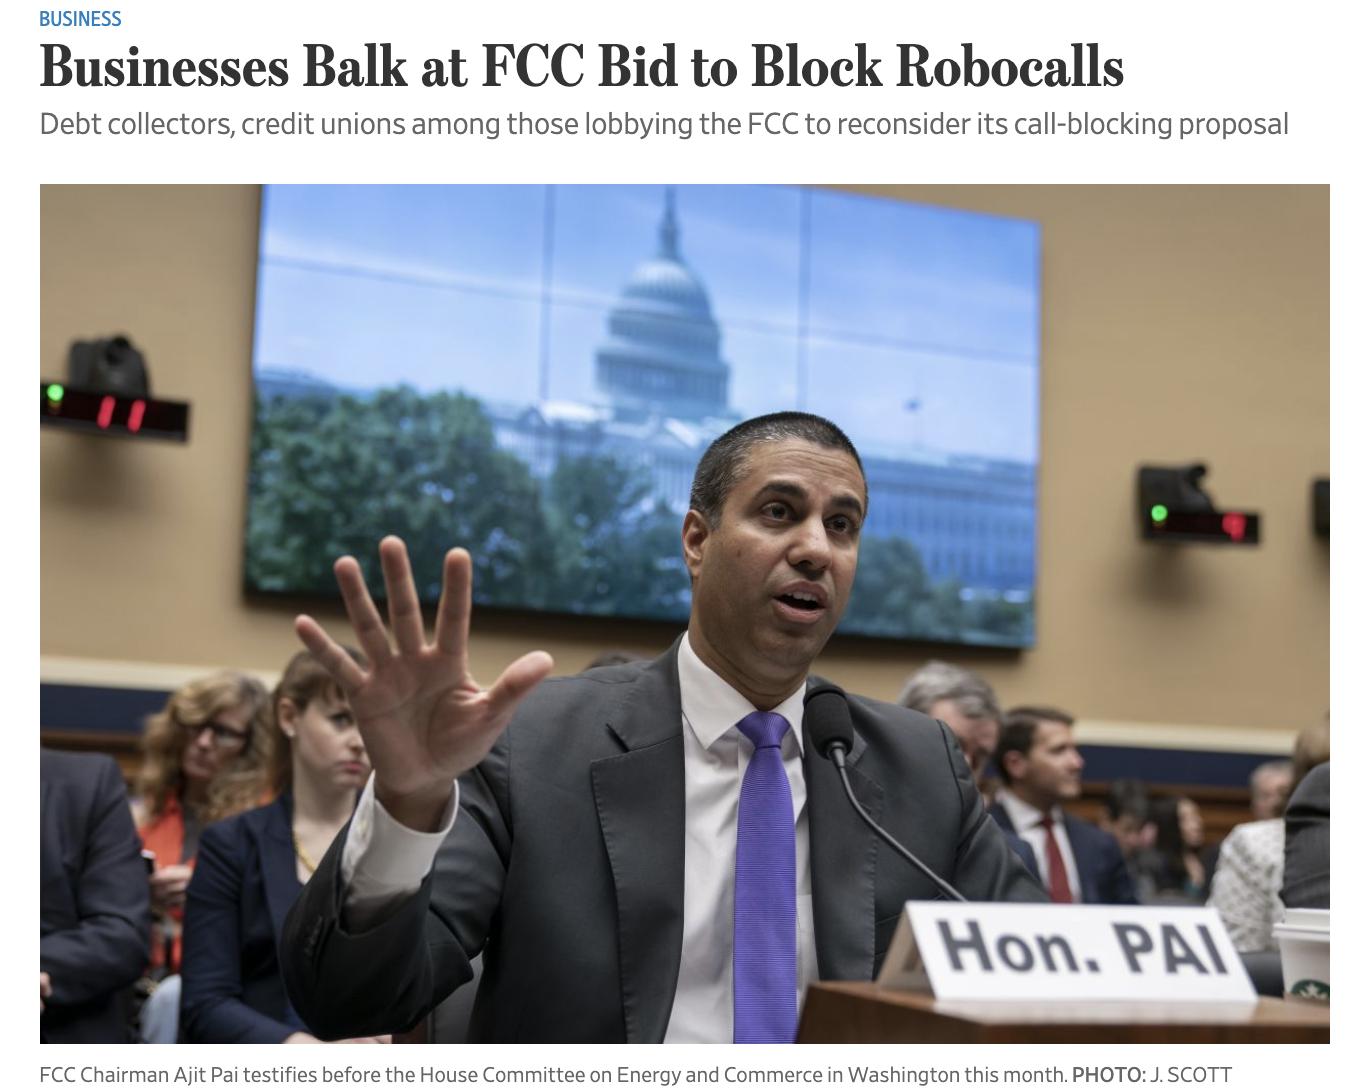 Businesses Balk at FCC Bid to Block Robocalls